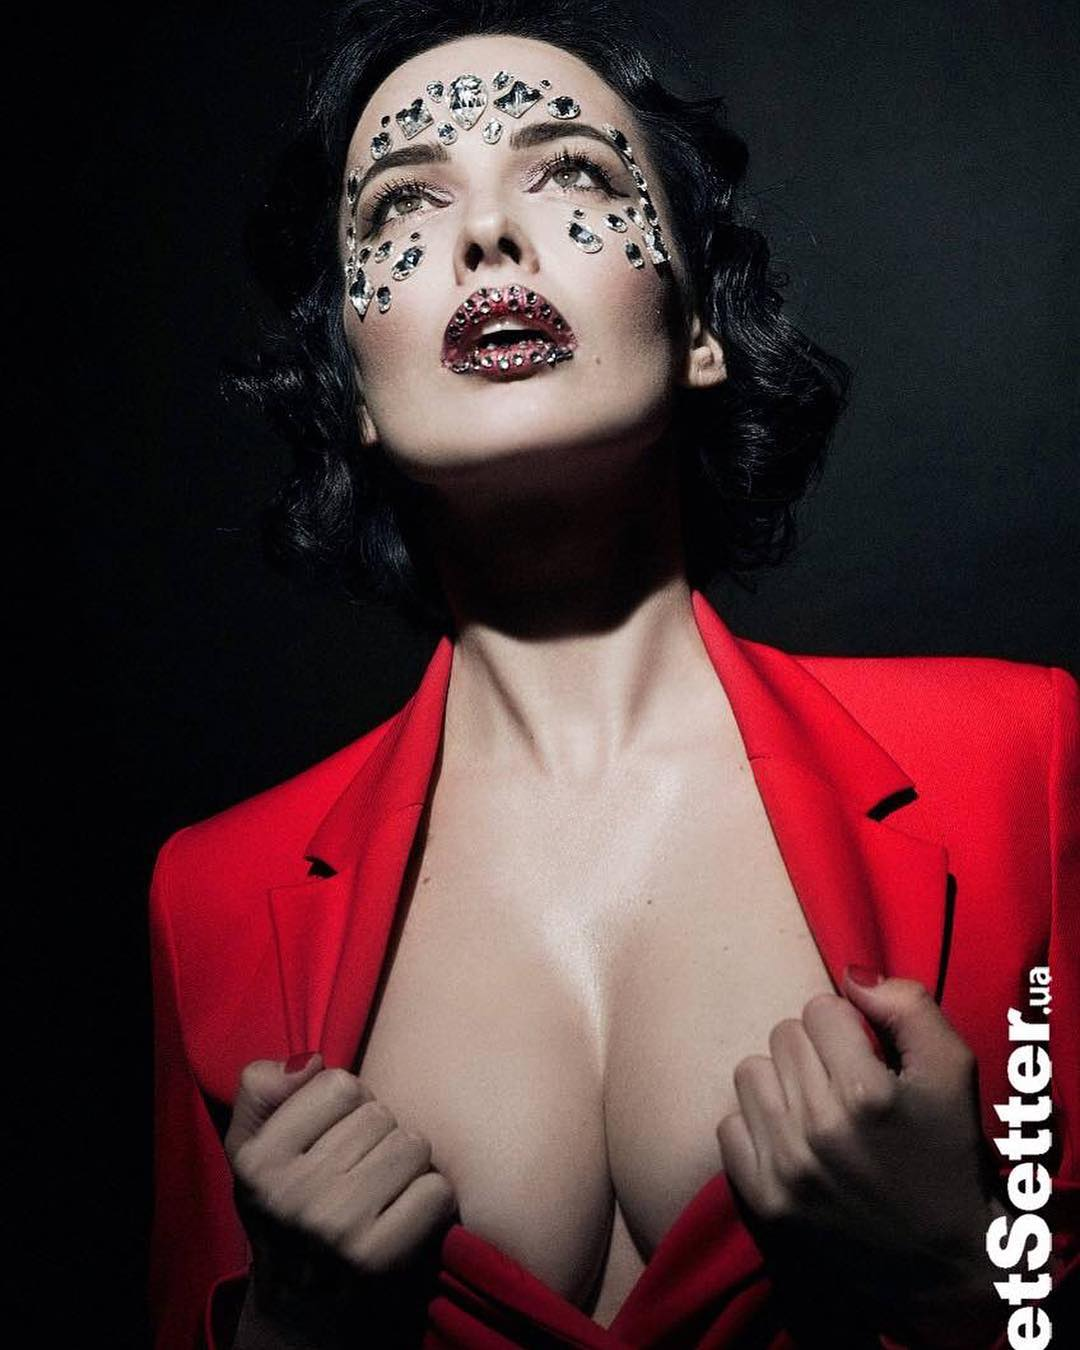 Даша Астафьева: Наша красота для @jetsetterua    @positiff @realpotap @mozgiband @niakrya @catrin_nikola @gromova.karinaa @mogila_tatiana #jetsetter